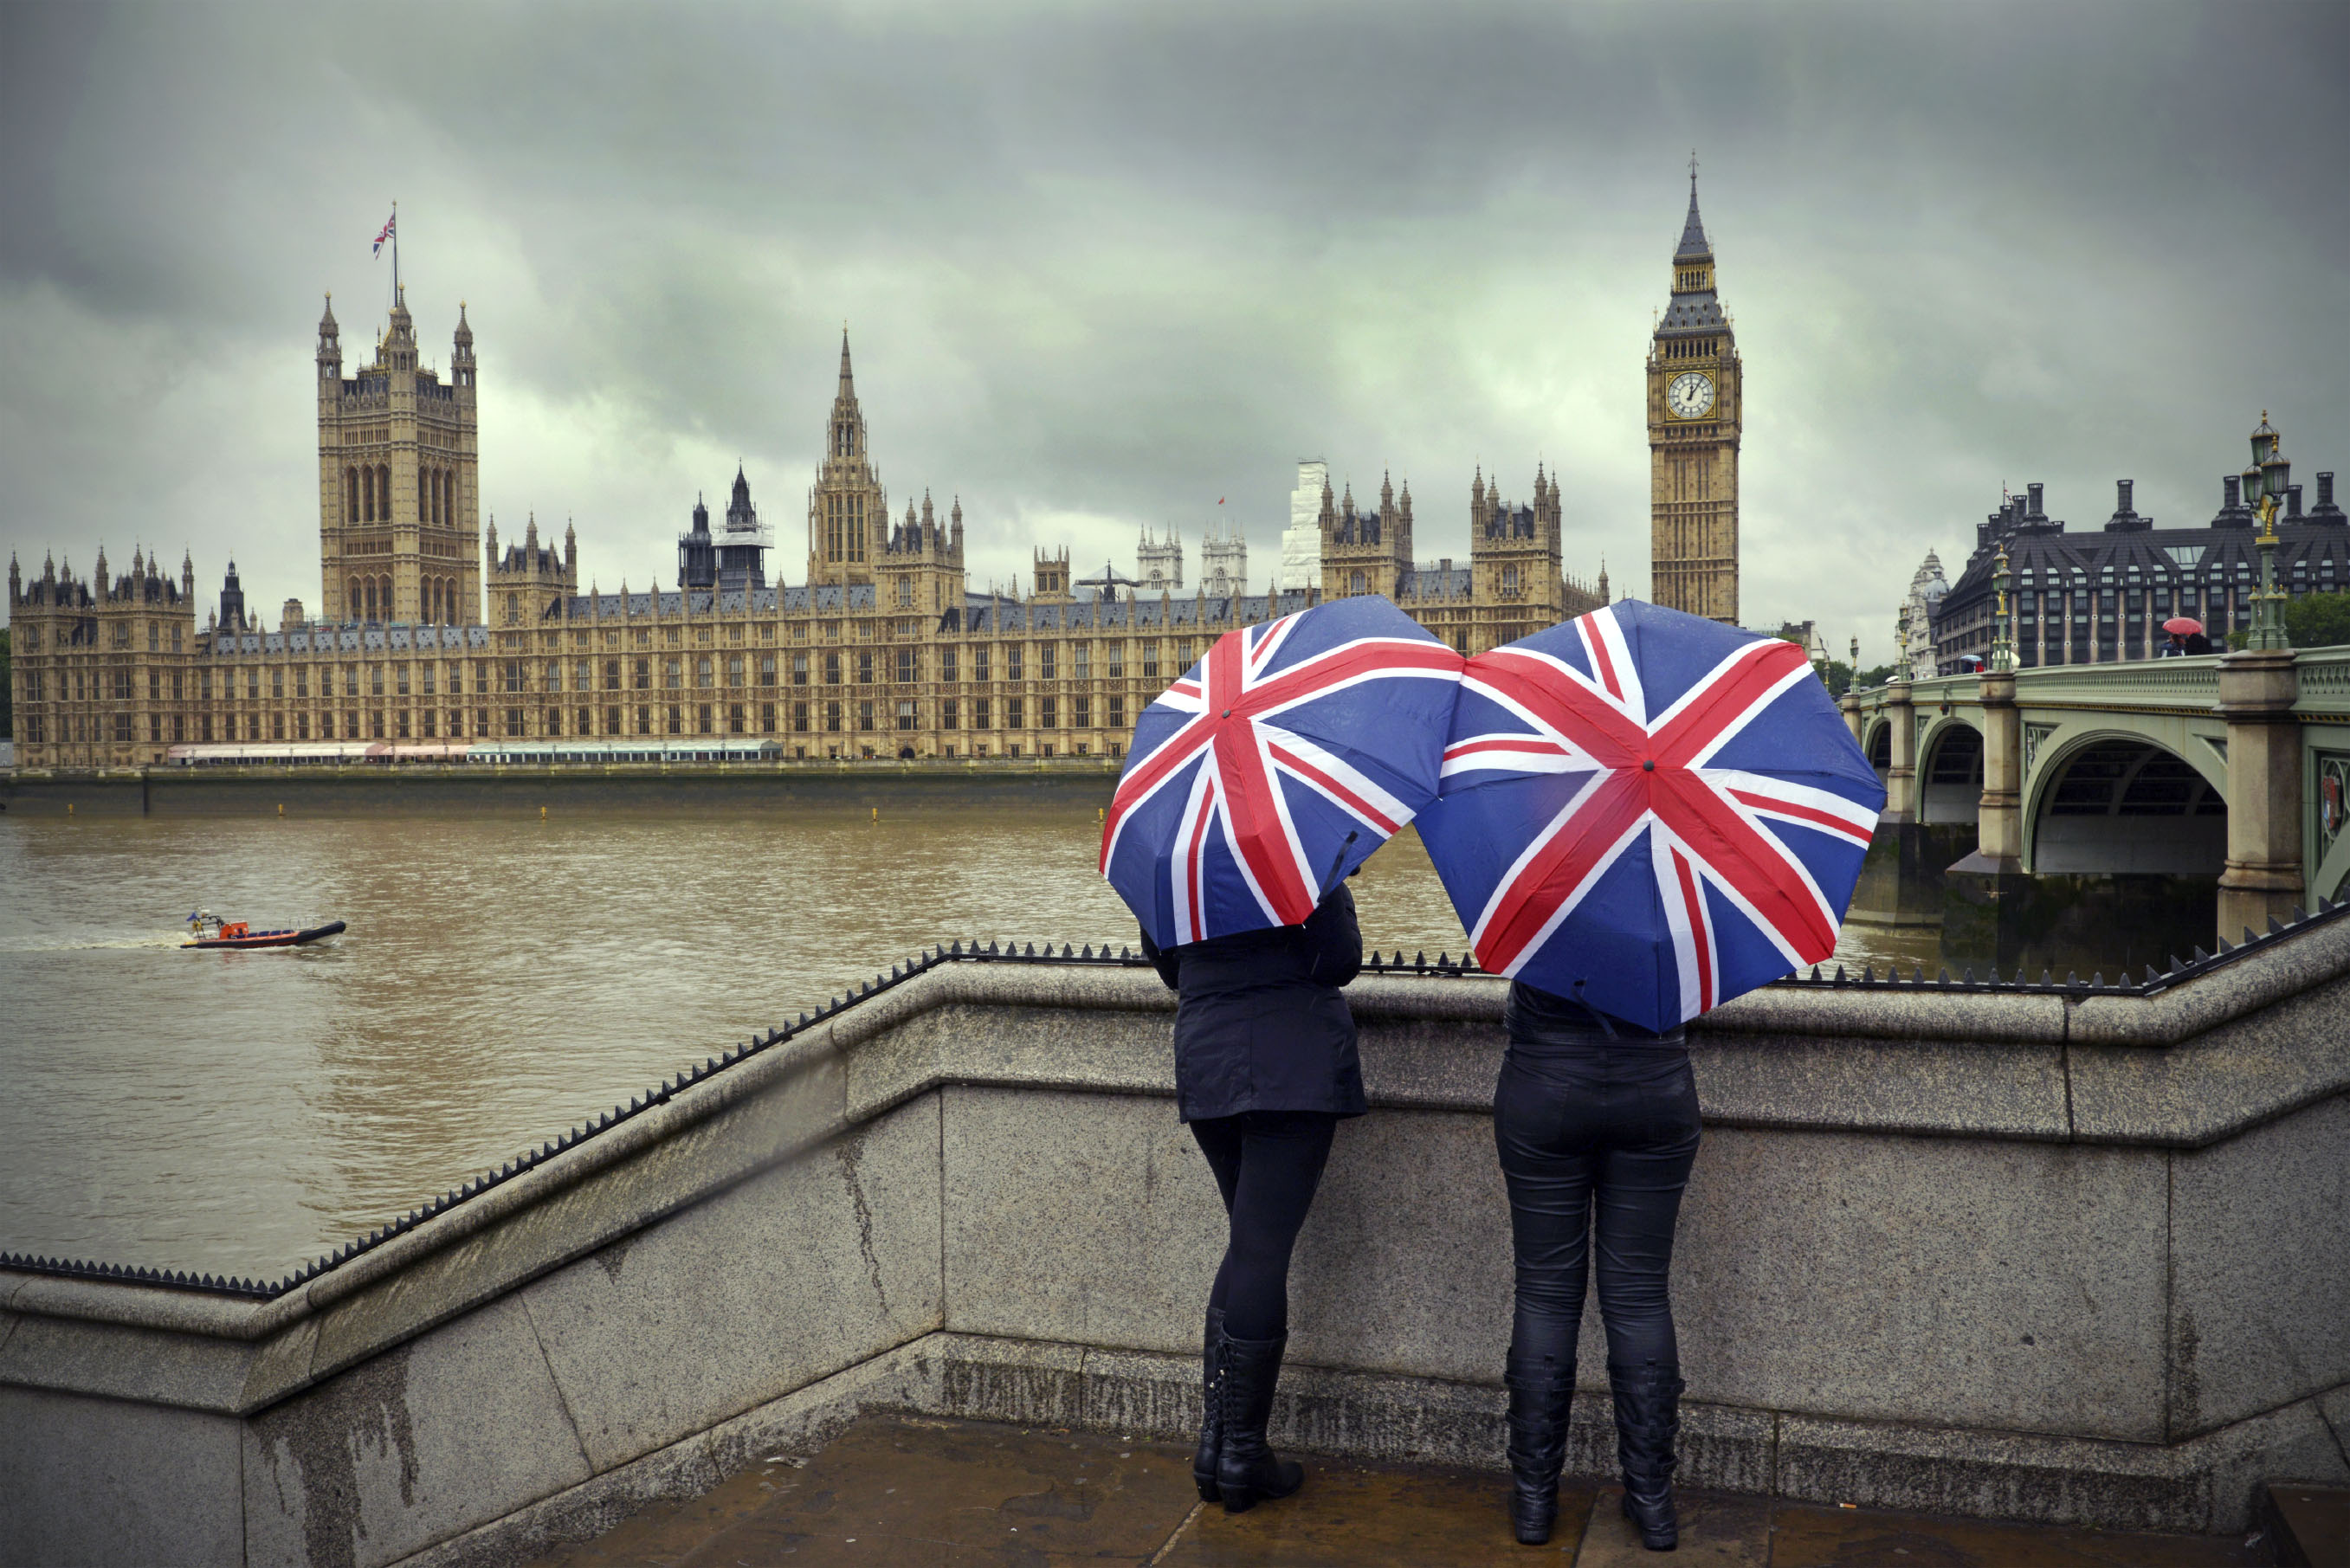 london rain Stock photo ID25512576